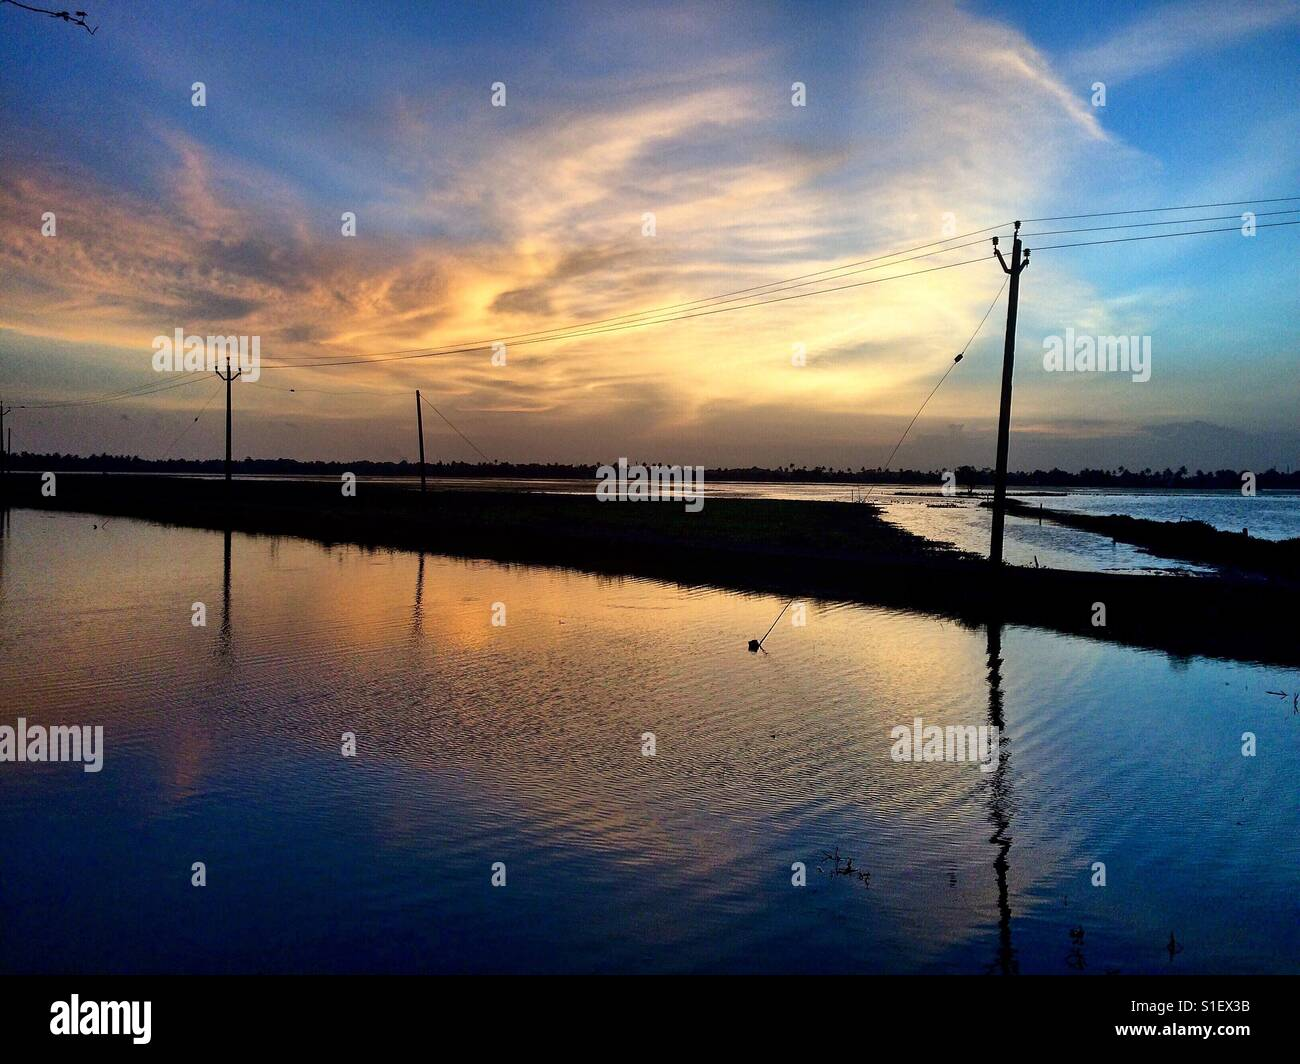 Evening view - Kuttanad - Stock Image